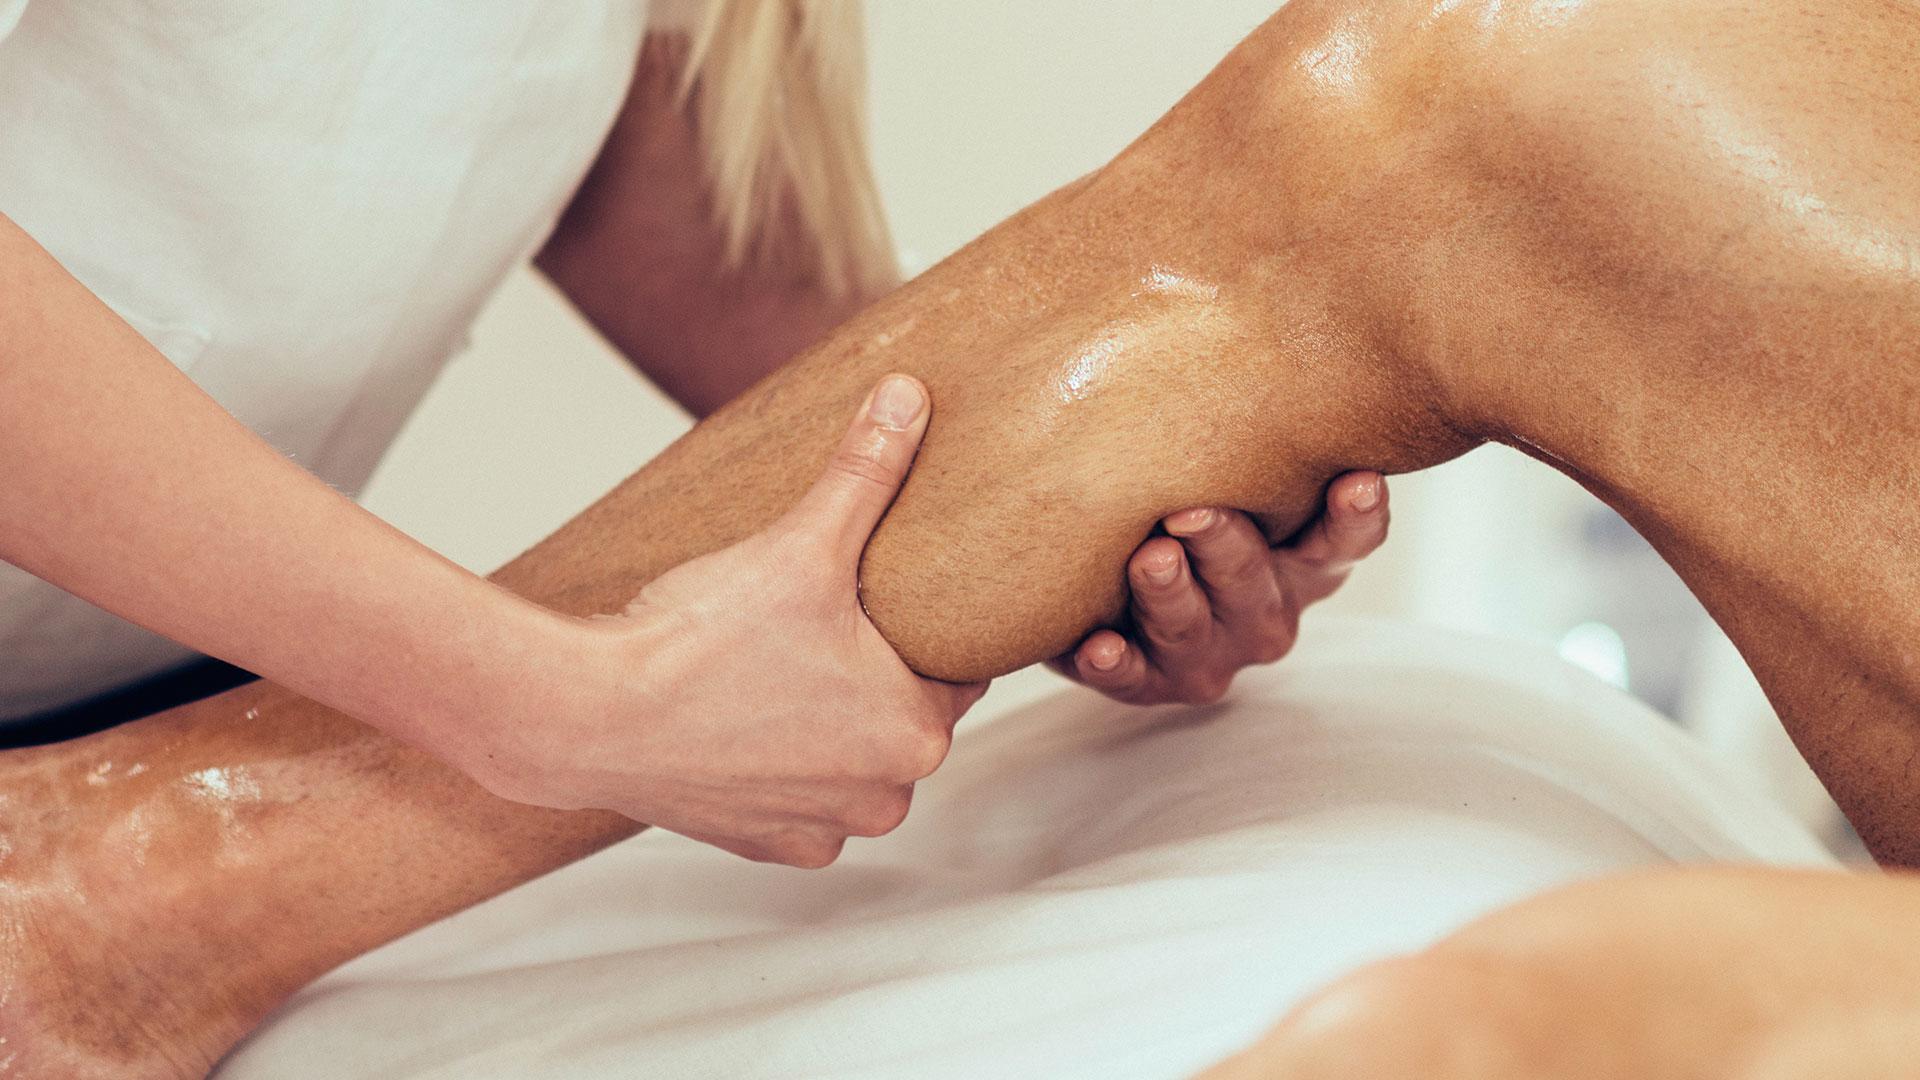 Manuele Therapie - Fysiotherapie Praktijk Hoogkerk - Ruskenborg